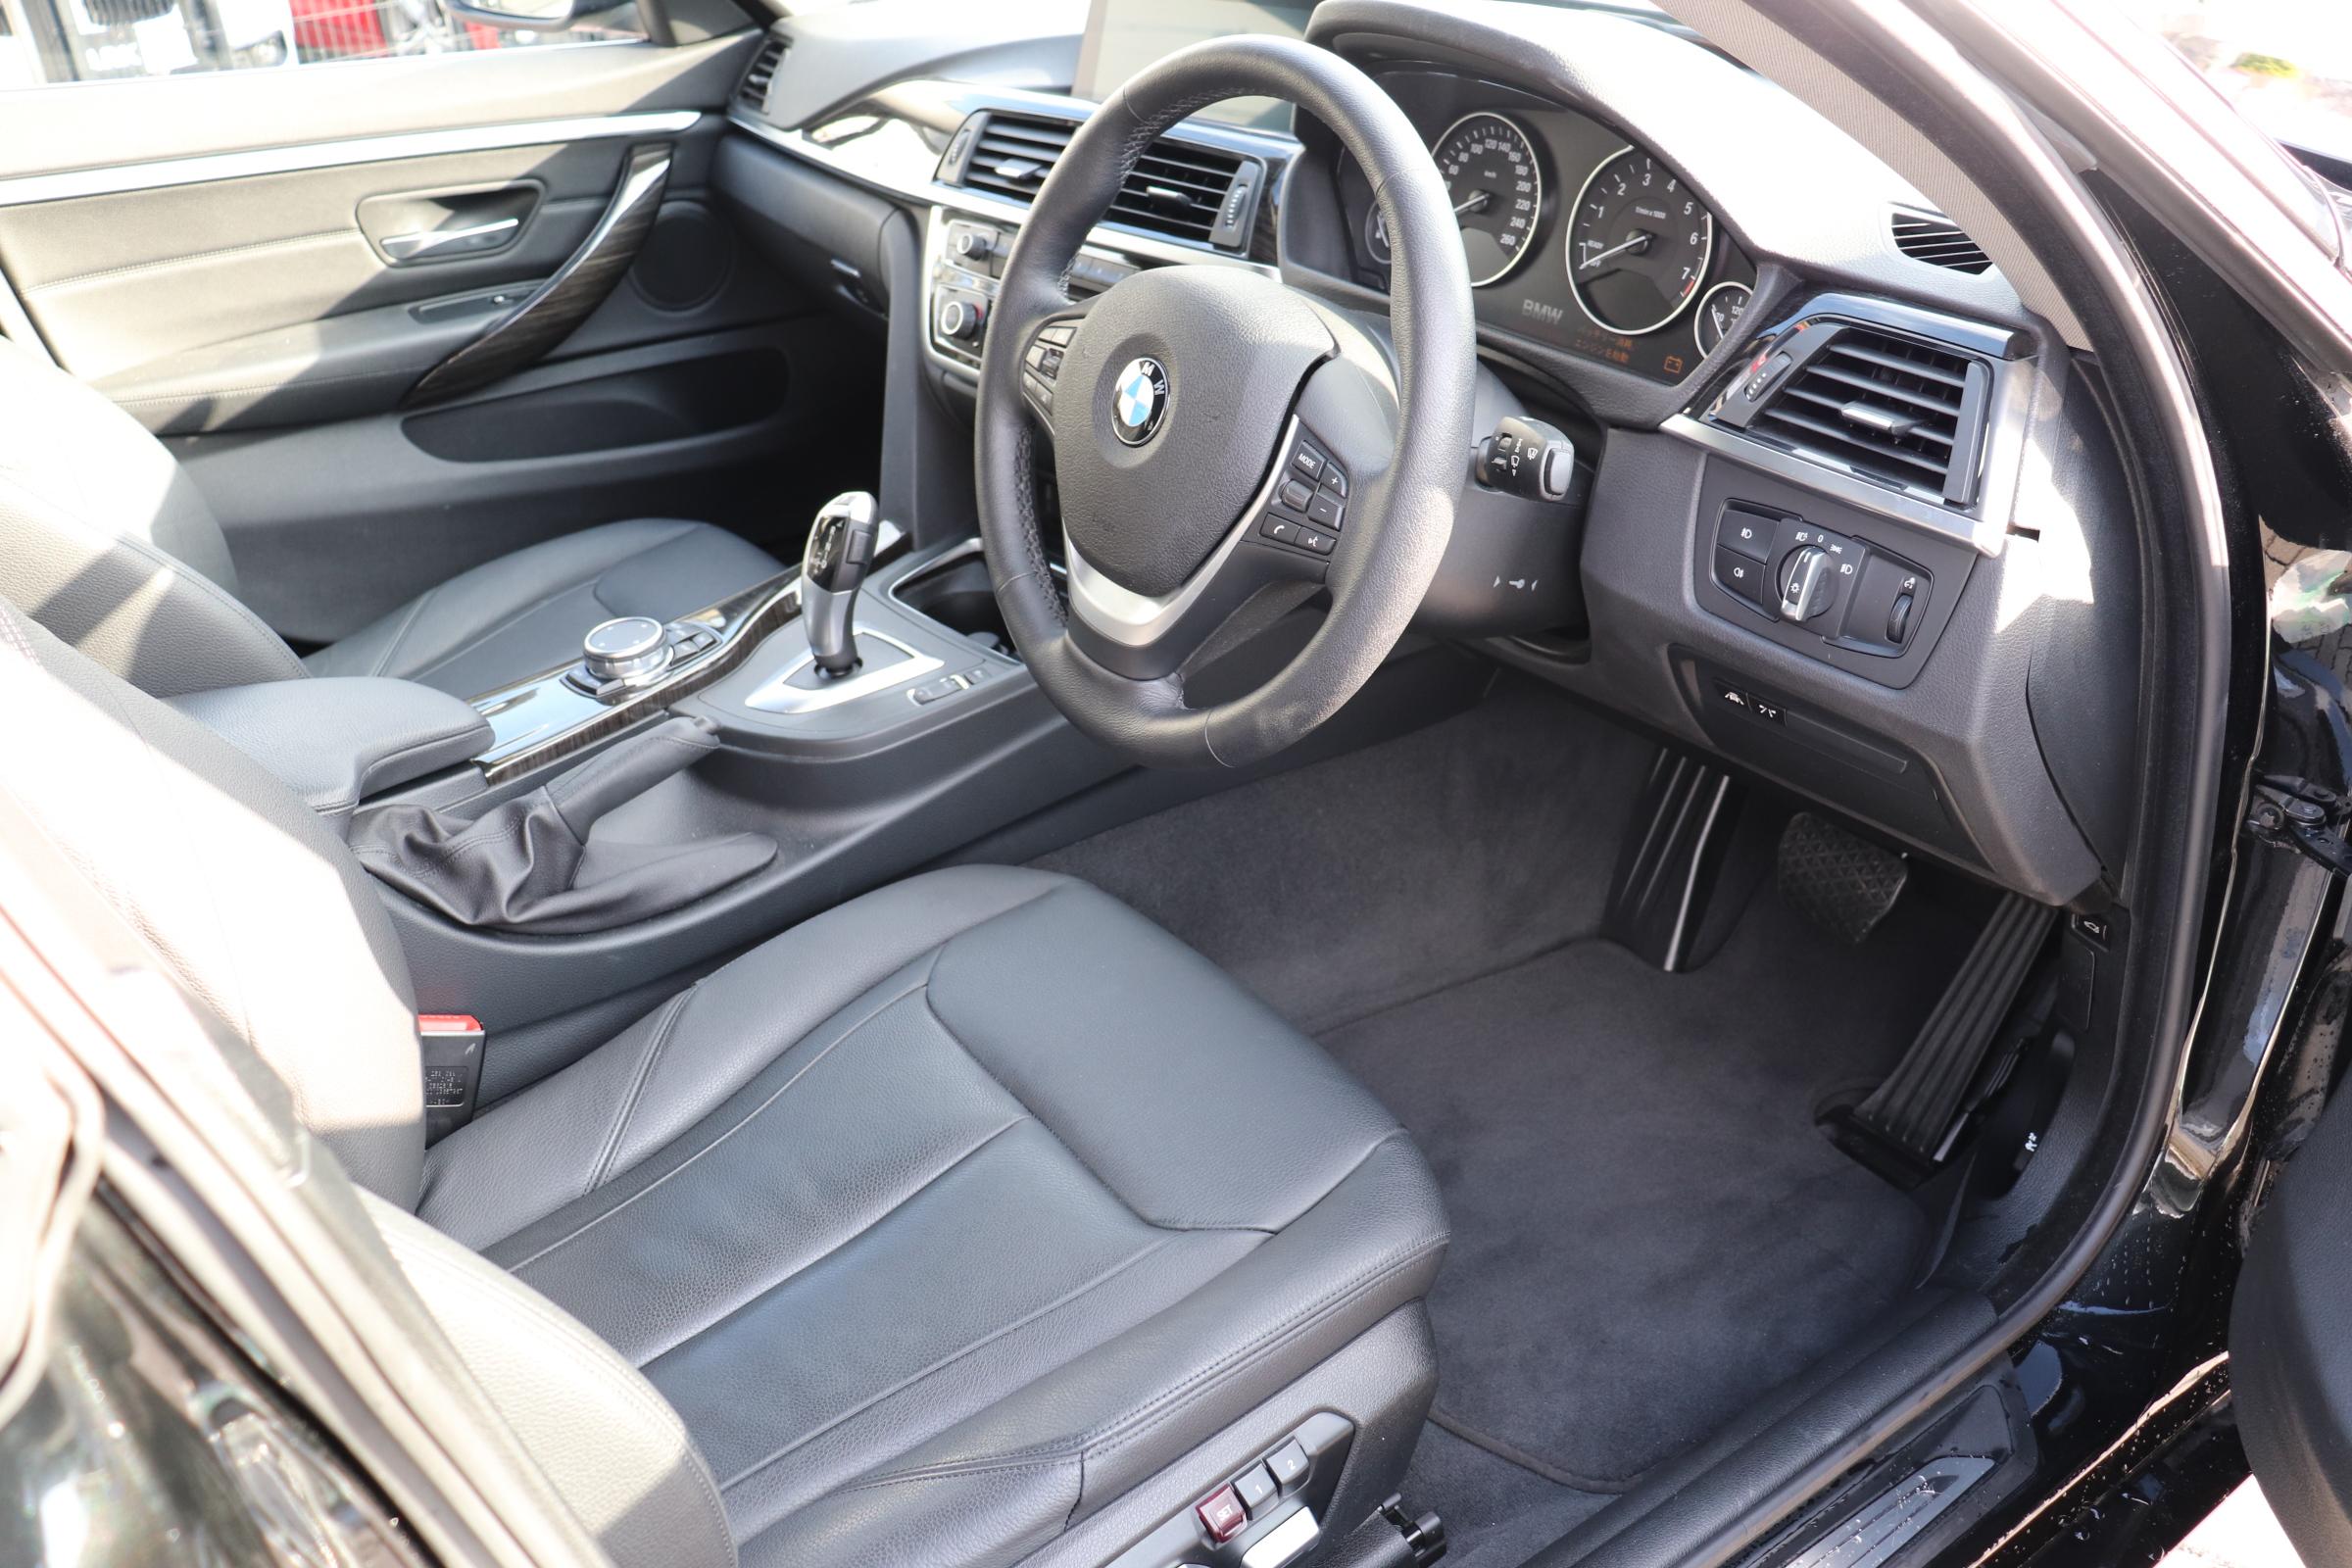 420iグランクーペ ラグジュアリー BEAMコンプリートカー ACC ブラックレザー車両画像14